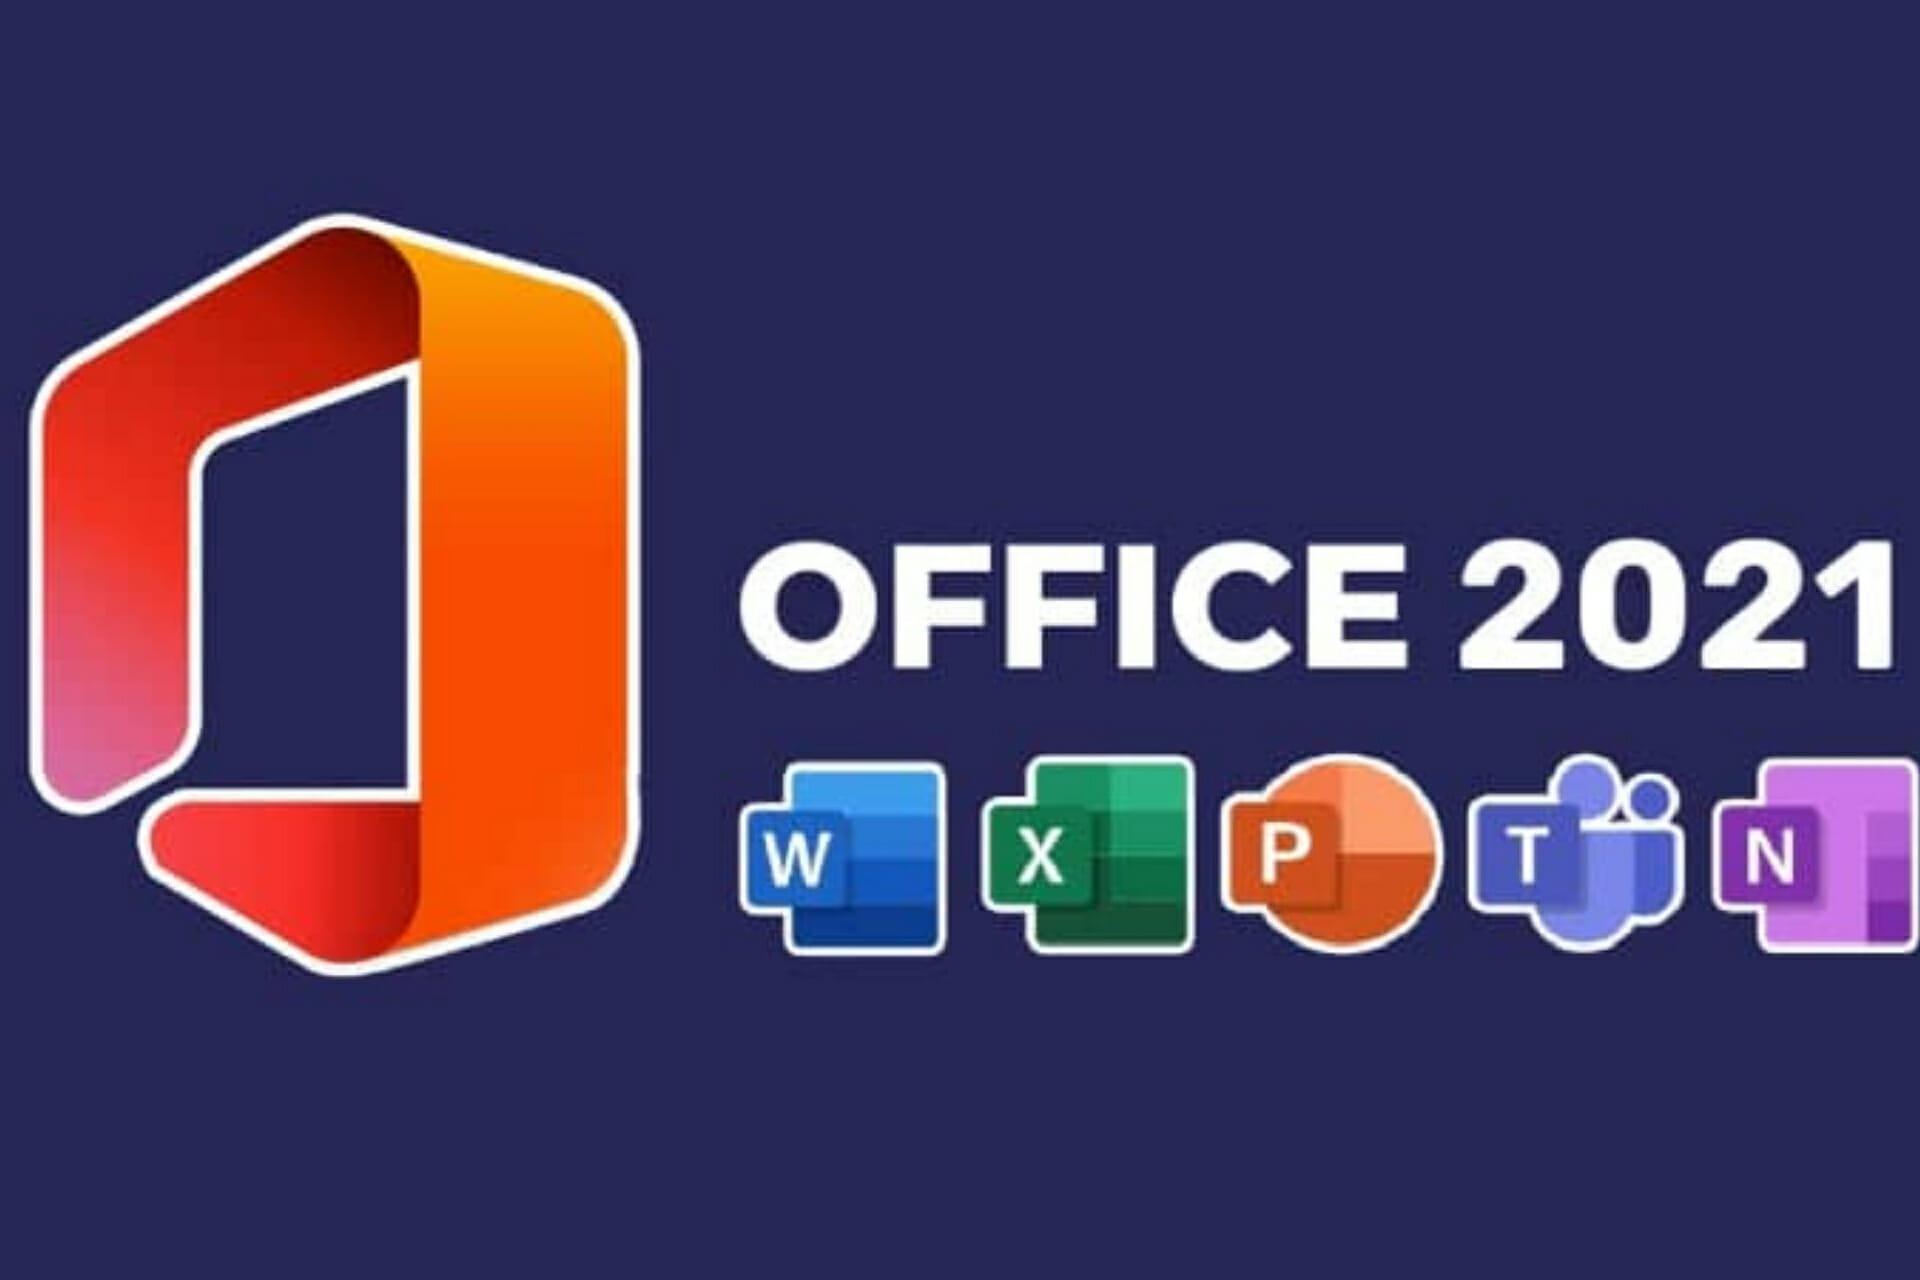 office-2021-1-2